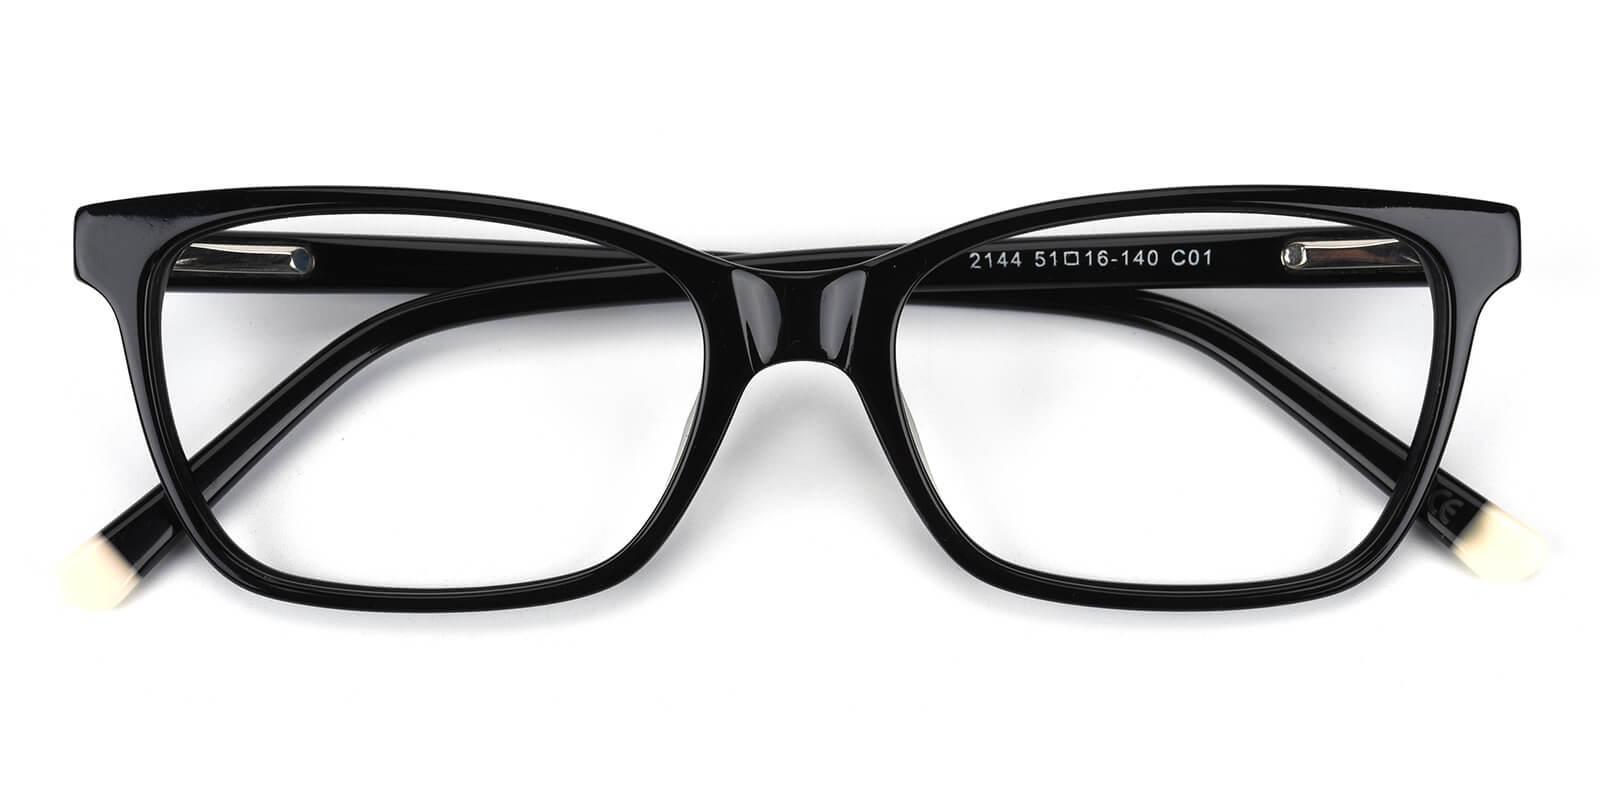 Waferay-Black-Cat-Acetate-Eyeglasses-detail